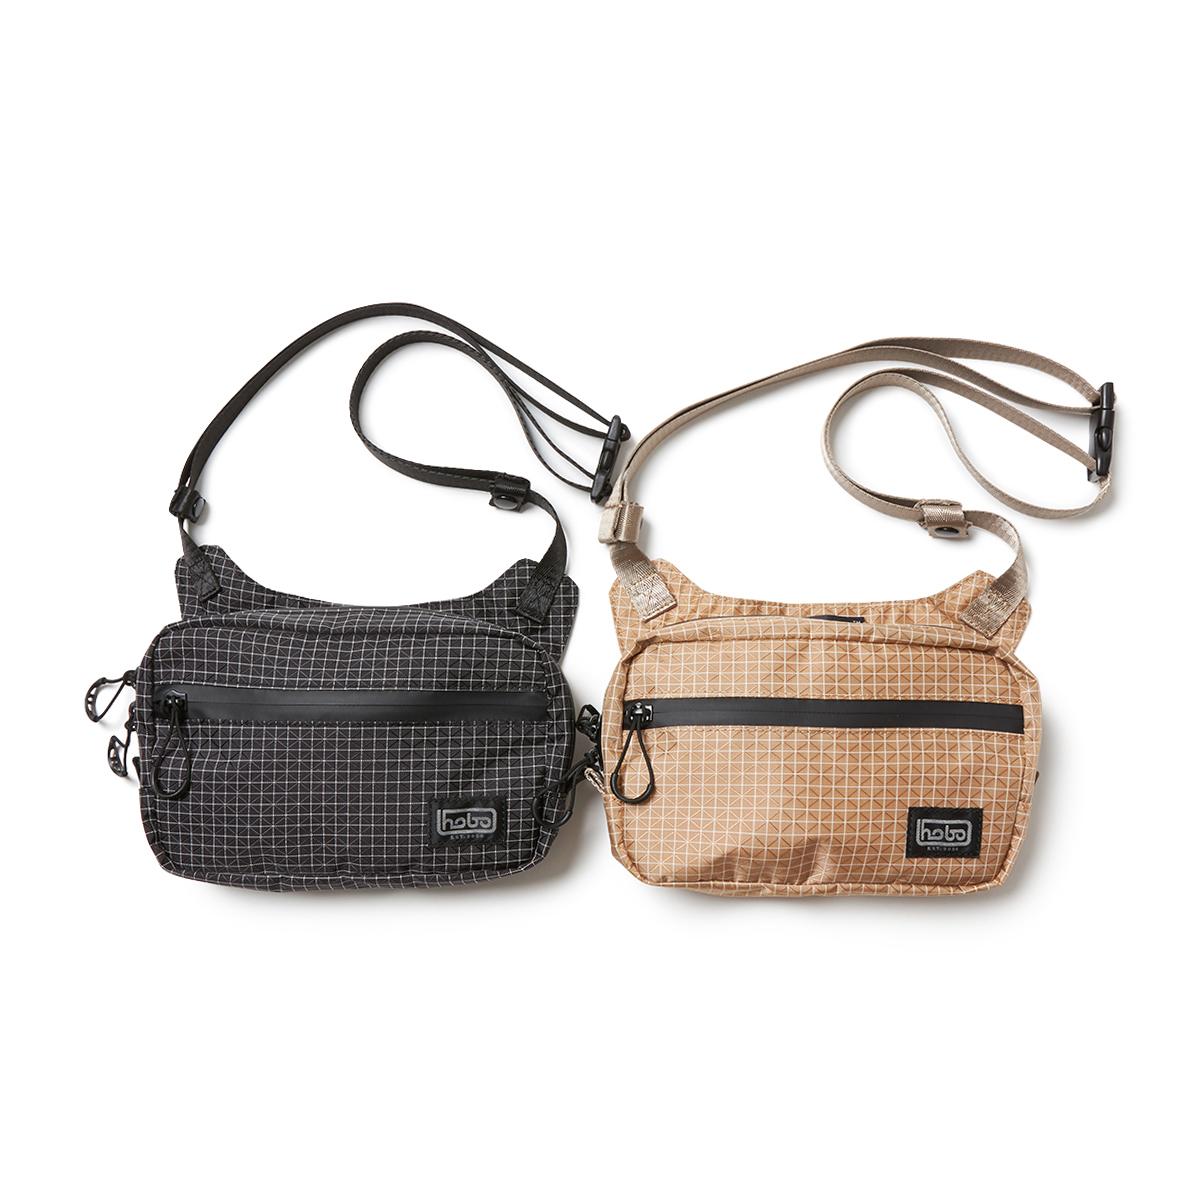 HOBO / SPECTRA®︎ X-GRIDSTOP NYLON WAIST BAG